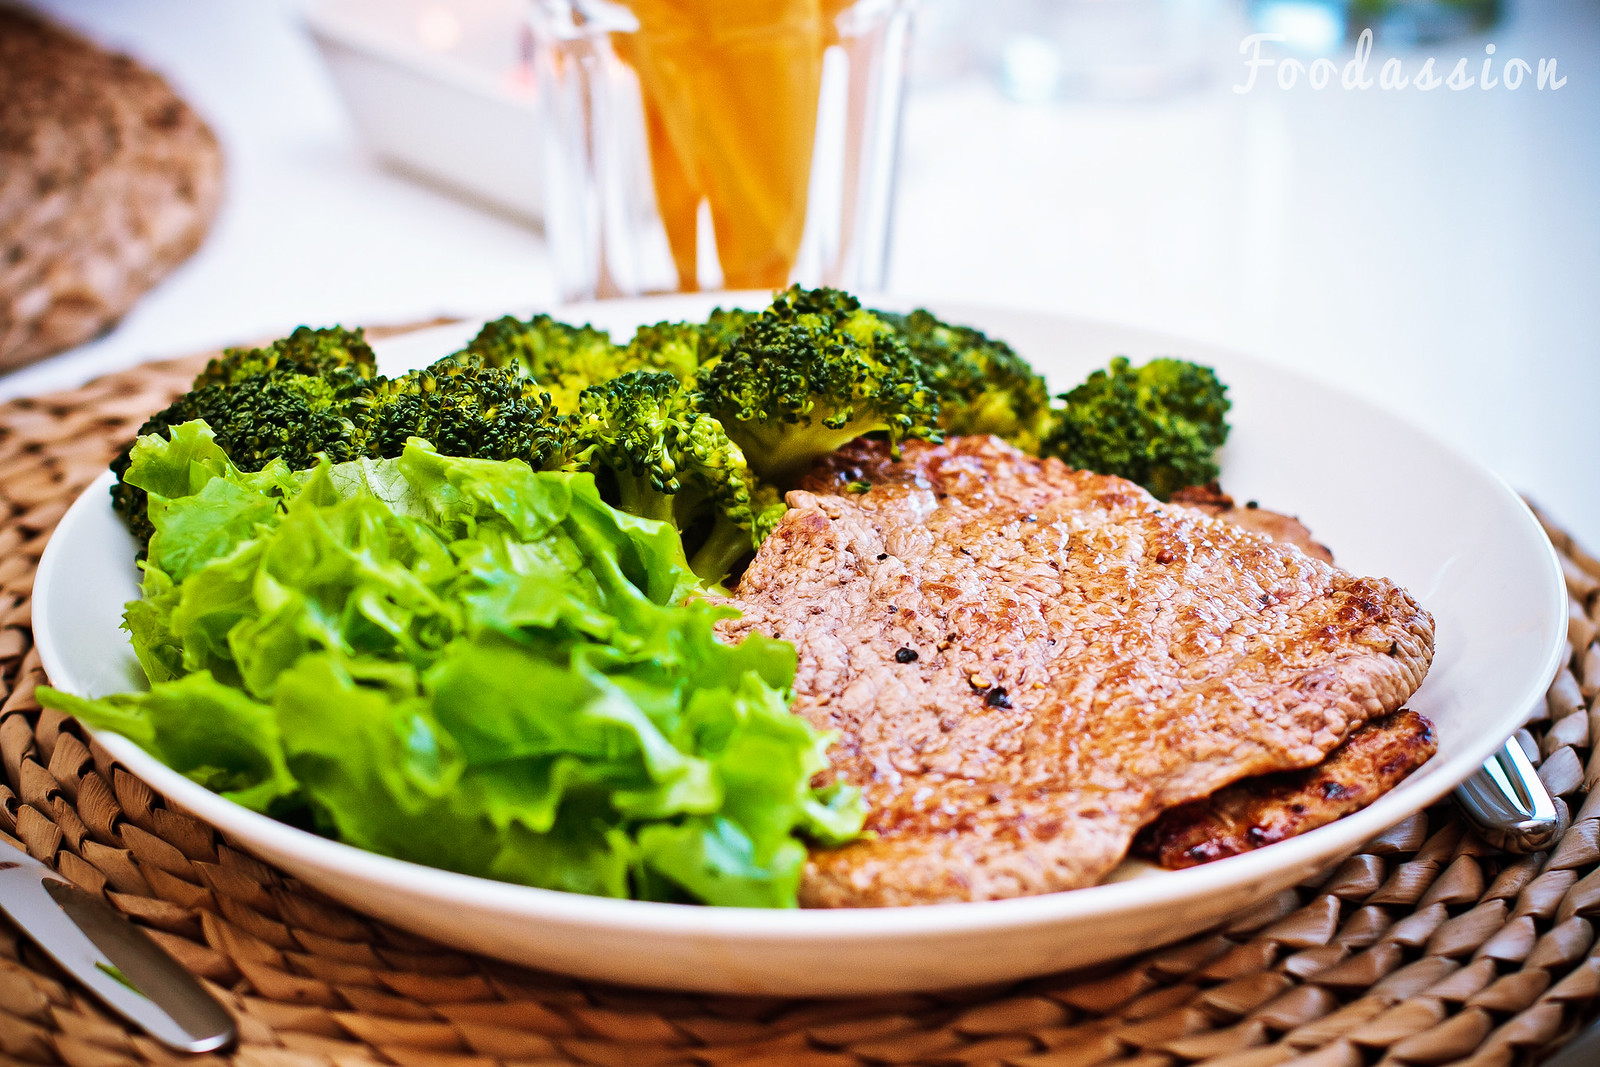 Pihvi, parsakaalia ja salaattia